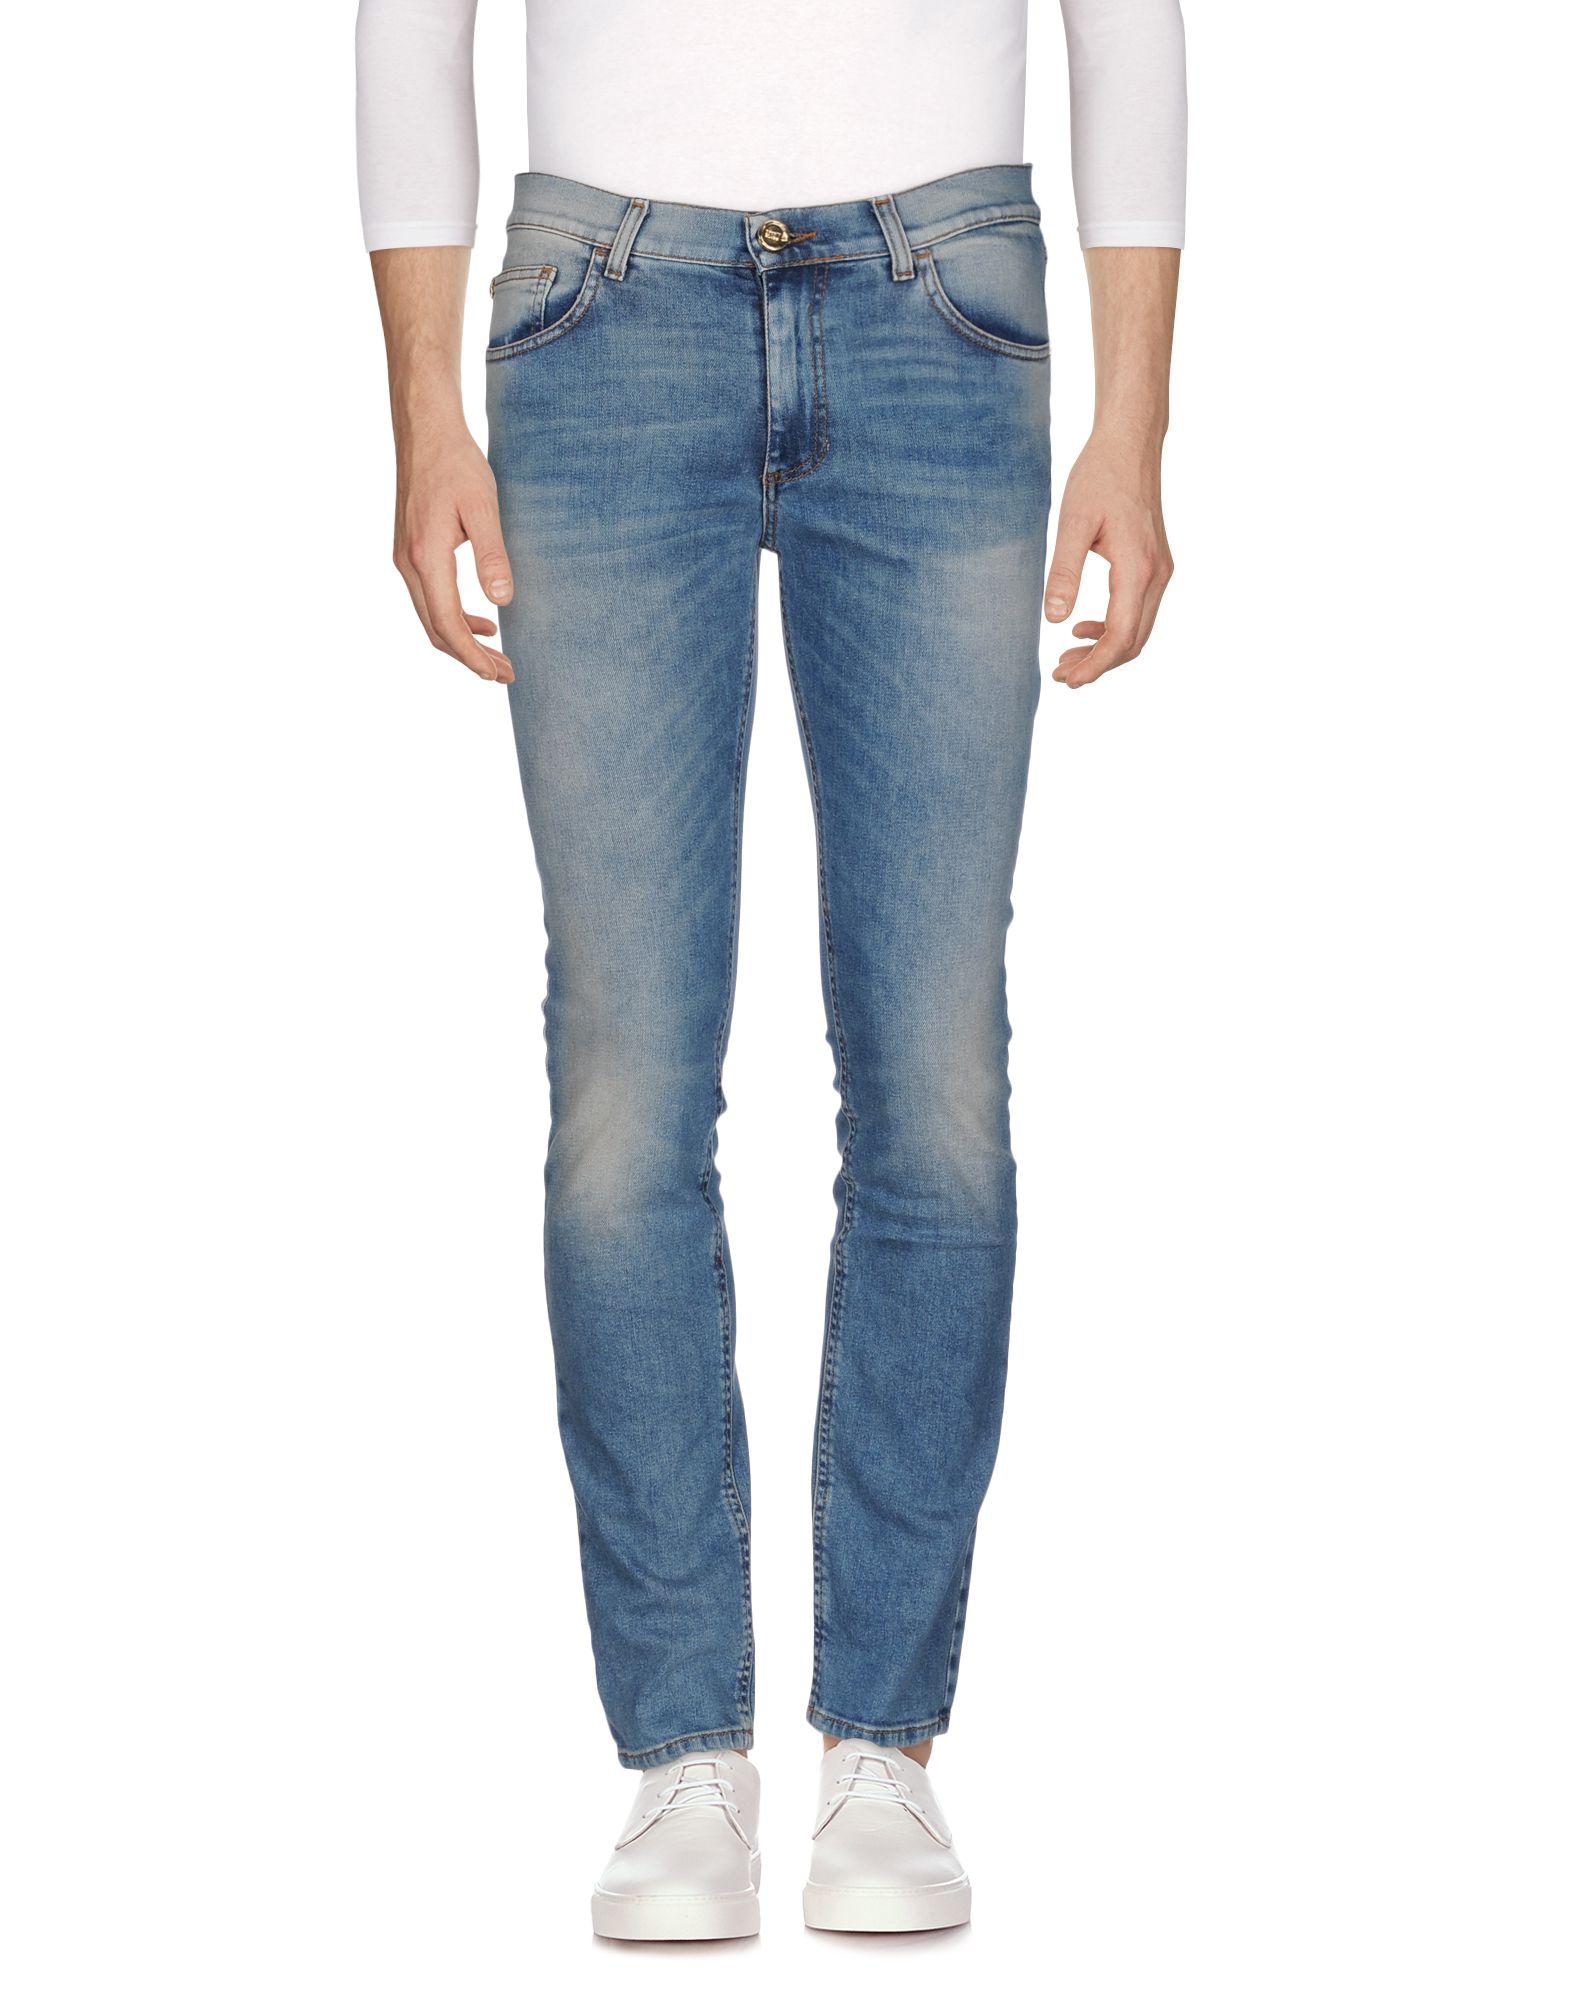 Pantaloni Jeans Class Roberto Cavalli Uomo - Acquista online su